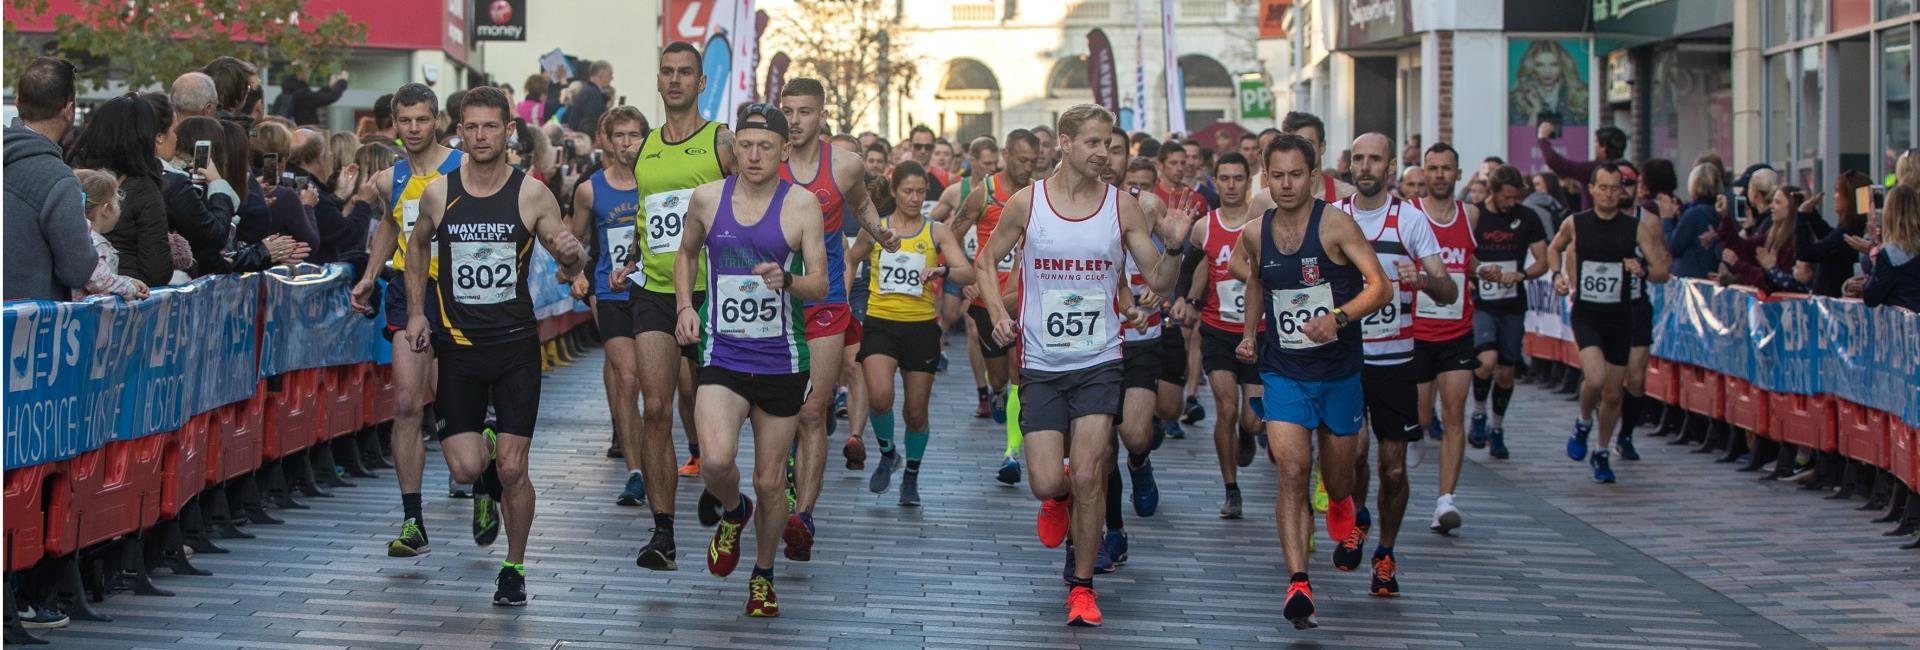 Chelmsford Marathon - cover image